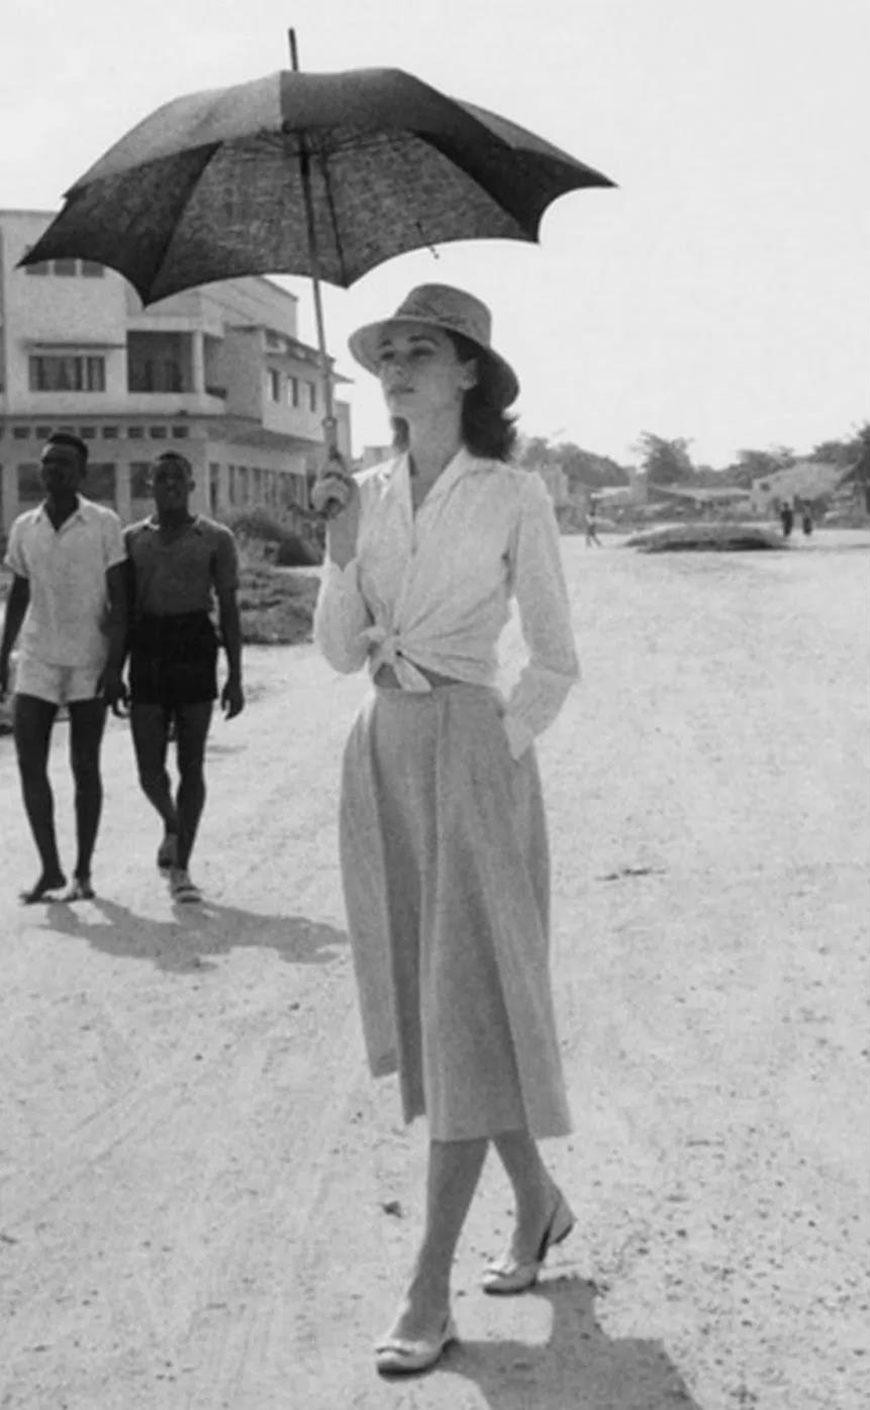 Audrey-Hepburn-wore-a-blouse